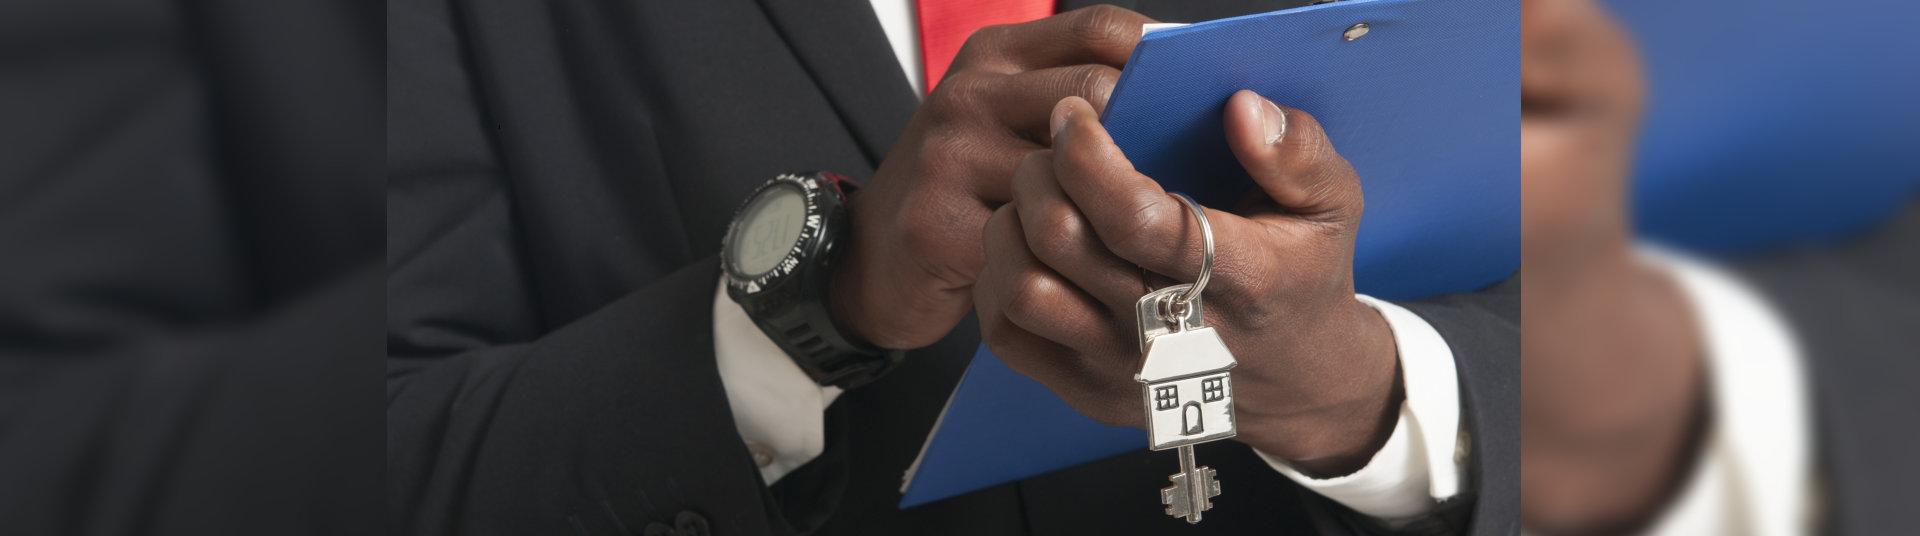 hand holding a house keychain